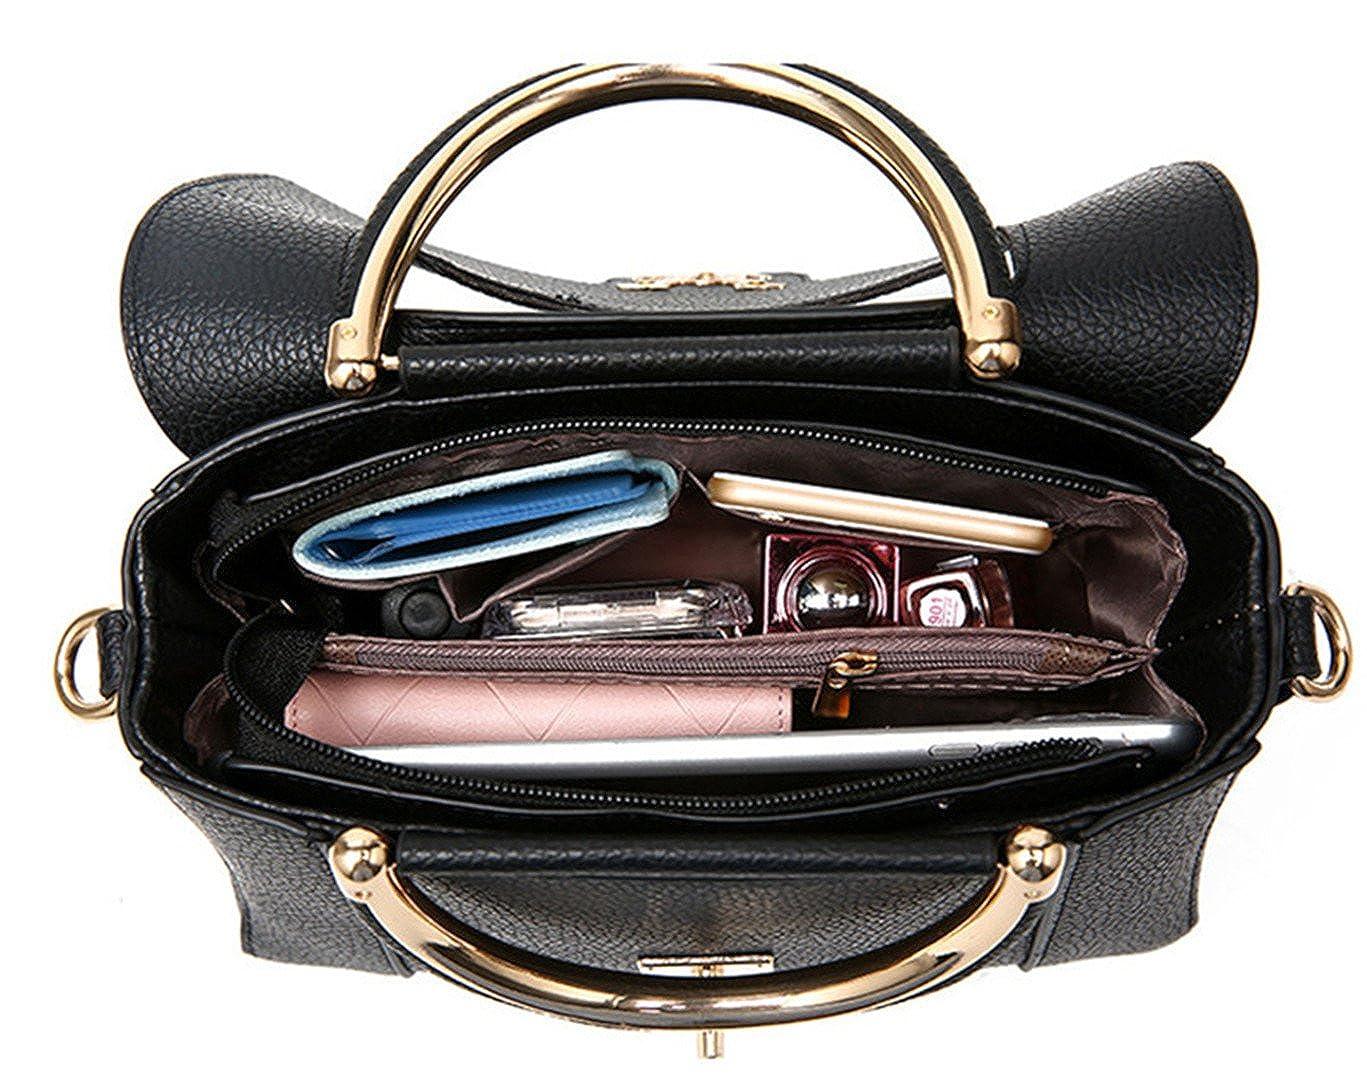 dae11997f8fd Amazon.com  Fake Designer Bags V Women s Luxury Leather Clutch Bag Ladies  Handbags Brand Women Messenger Bags Sac A Main Femme Handle 2  Luggage  combination ...